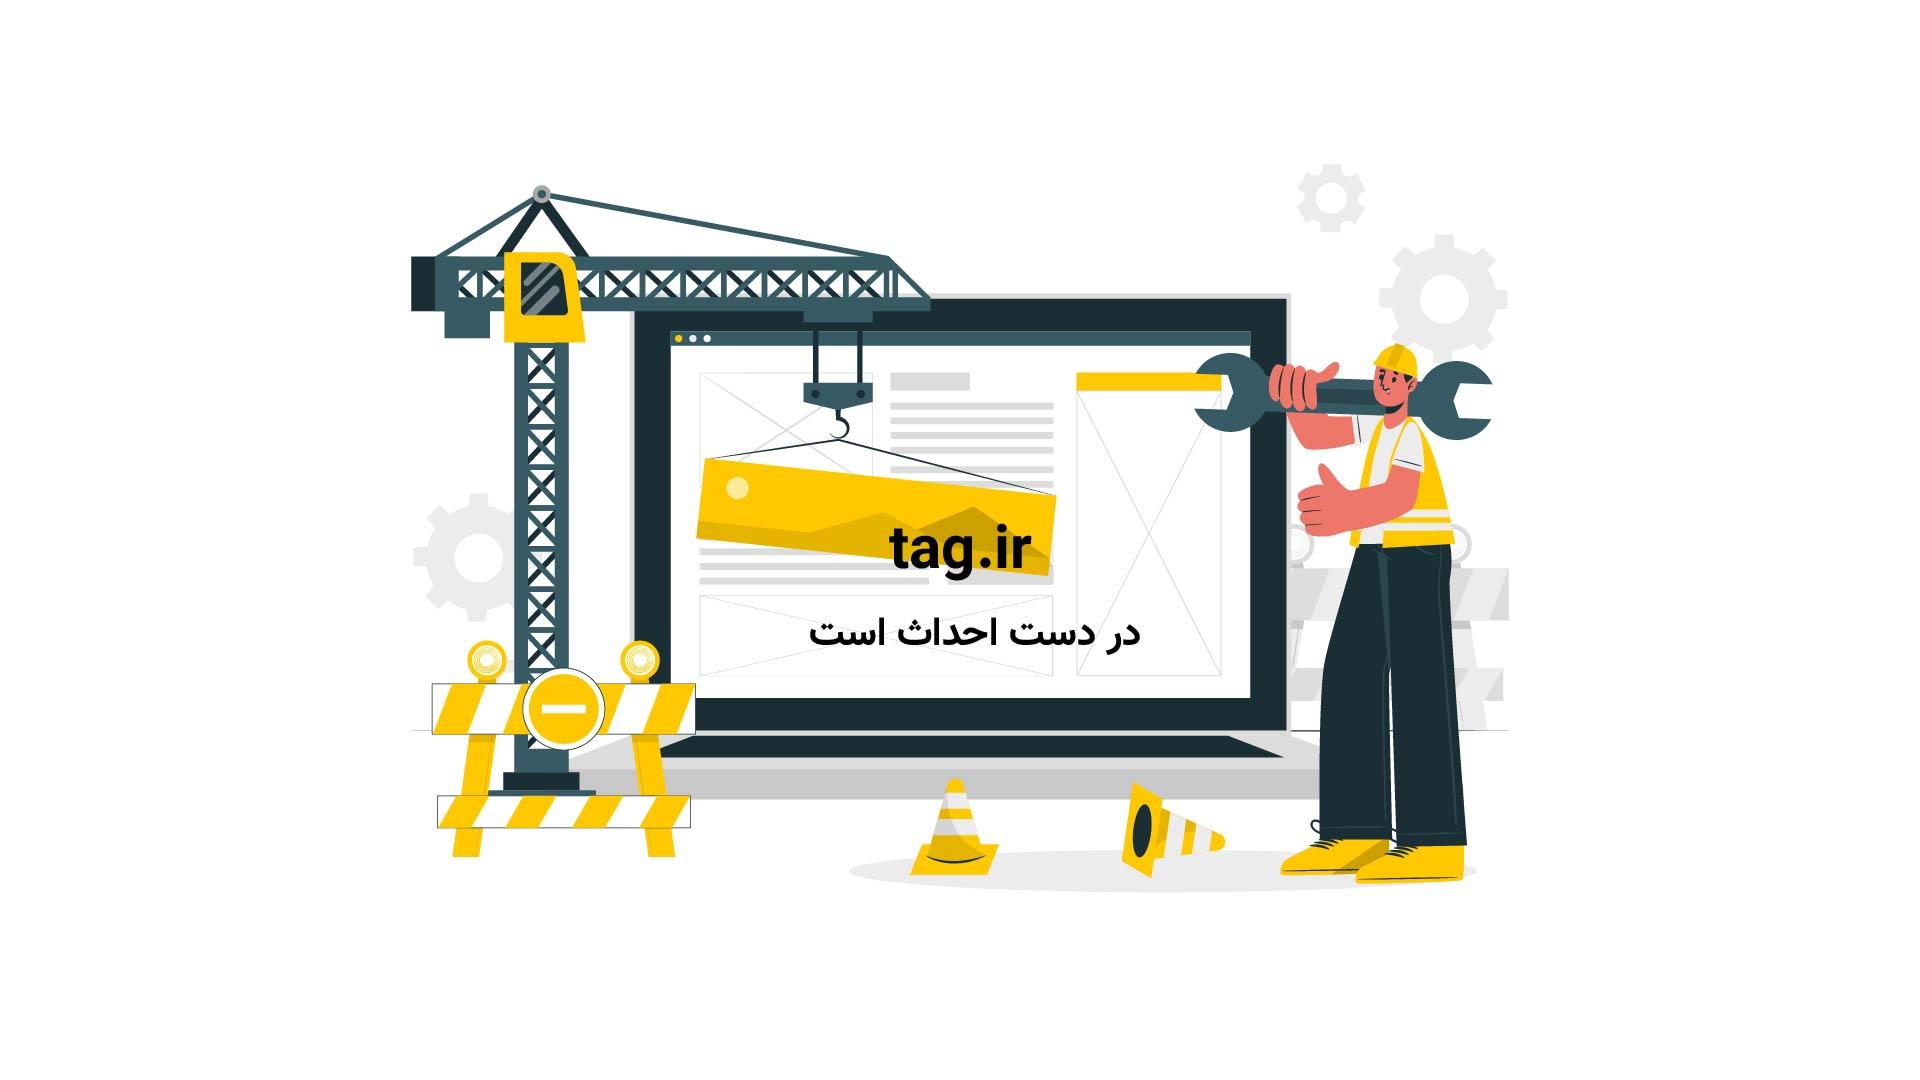 پیوند سلول بنیادی پوست به چشم محقق شد